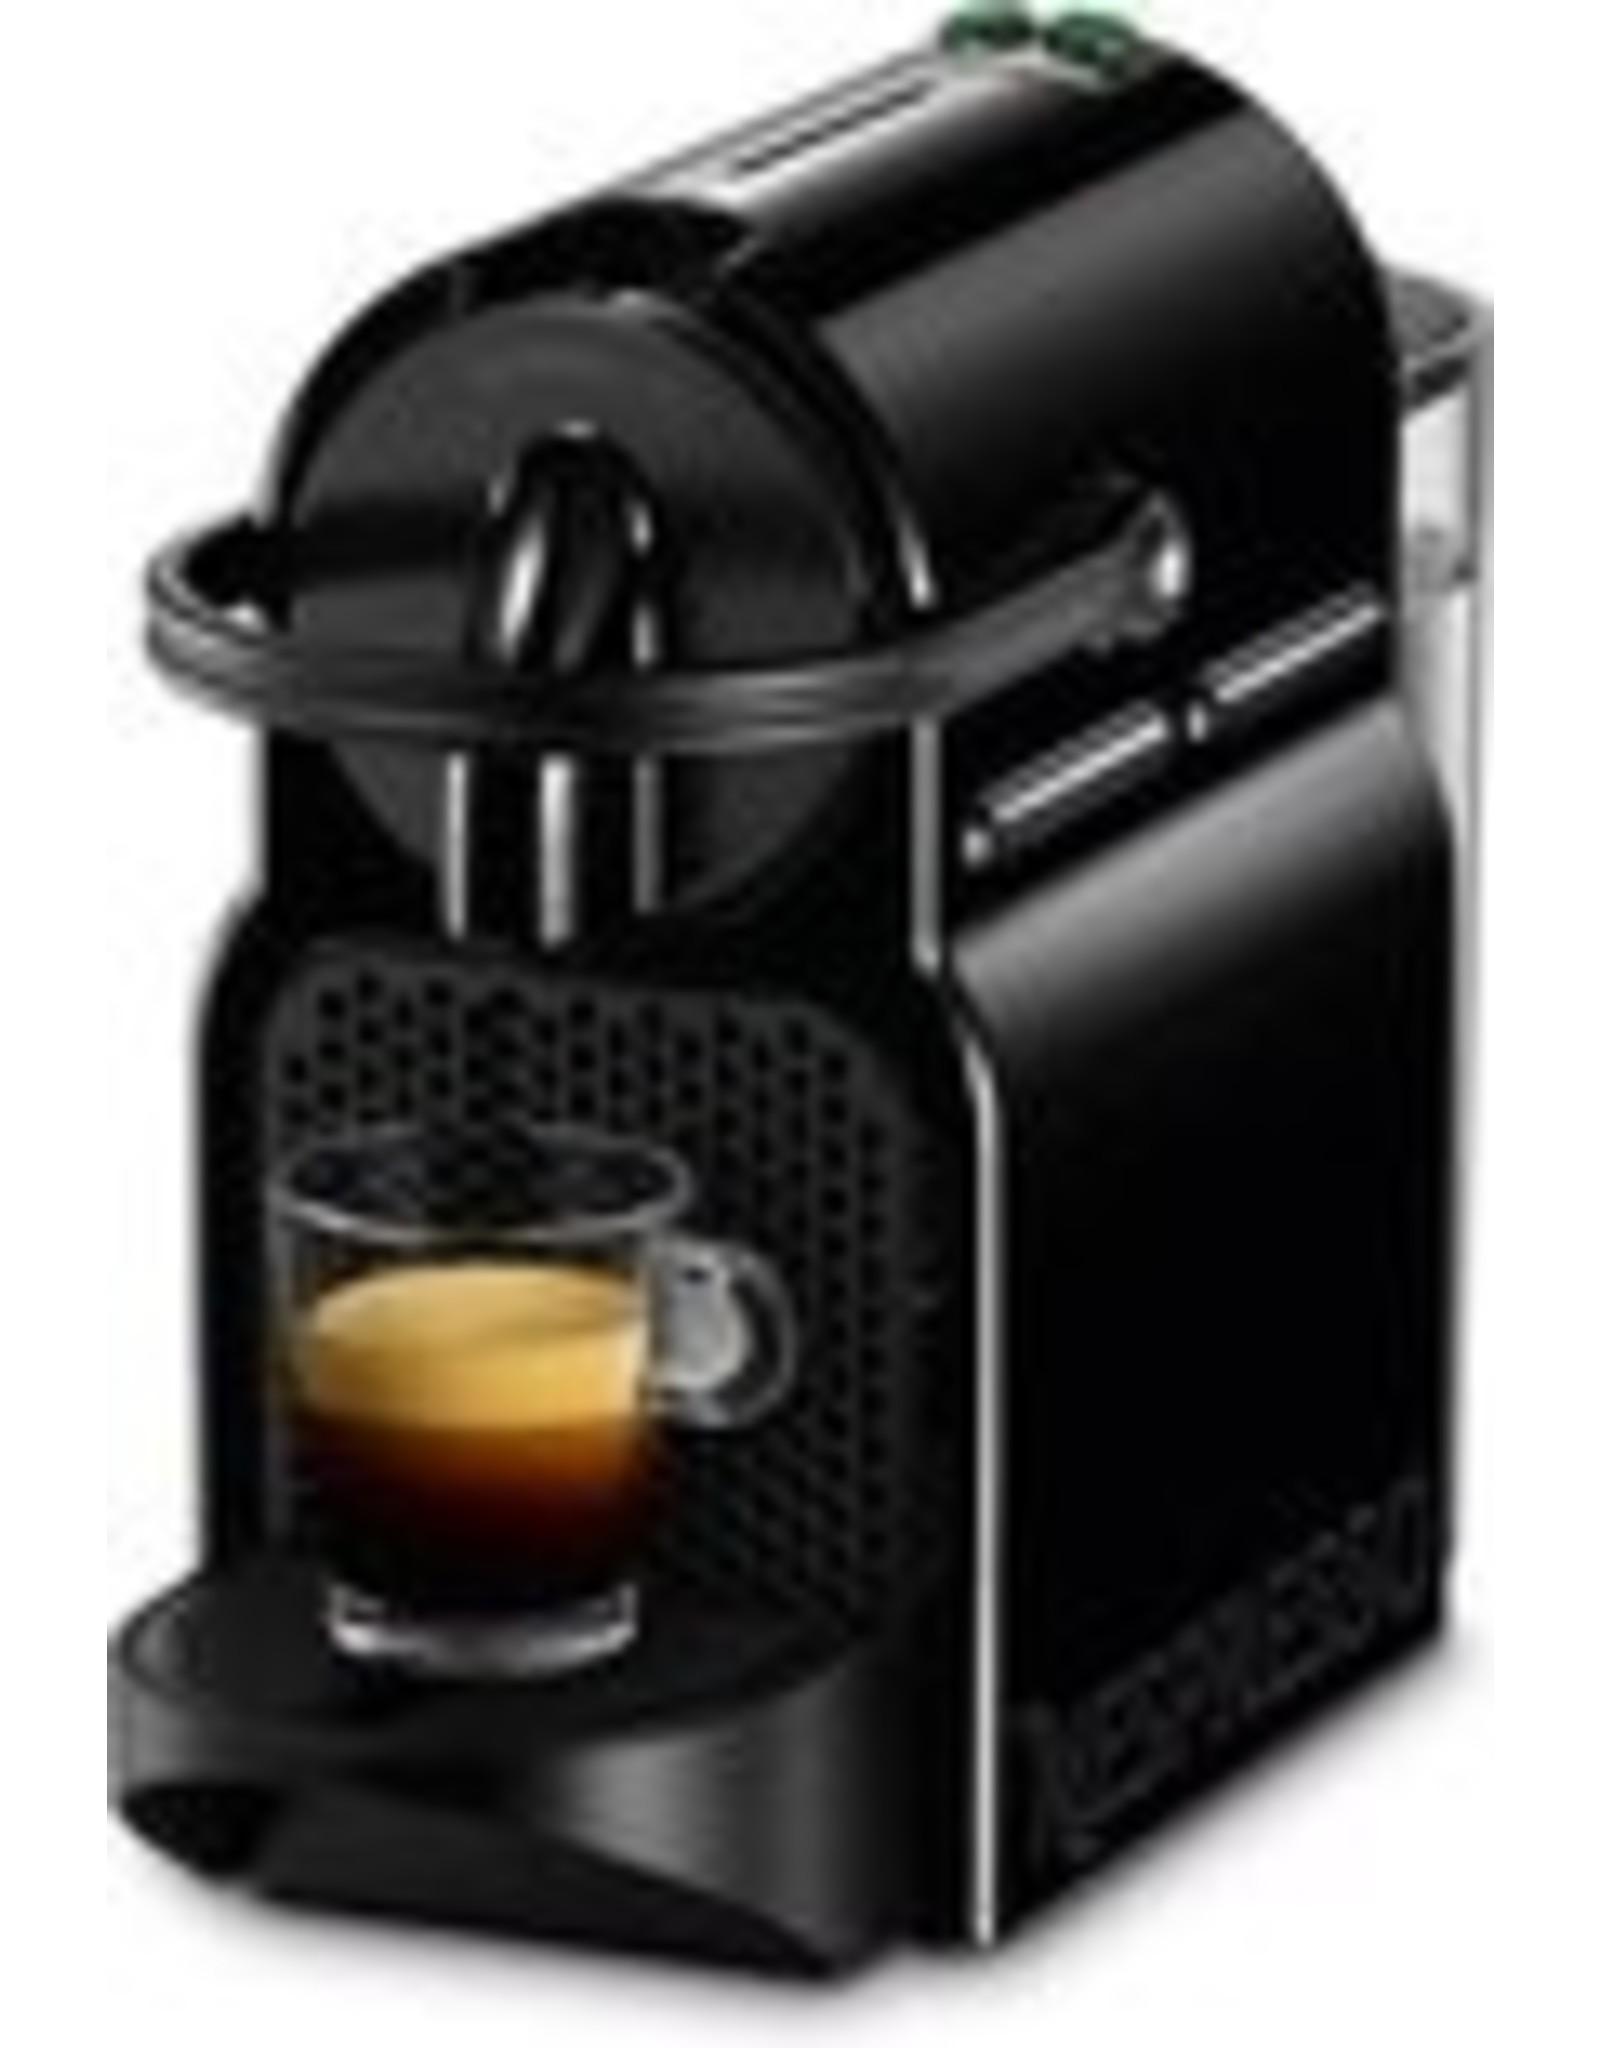 De'Longhi Nespresso De'Longhi Inissia EN80B